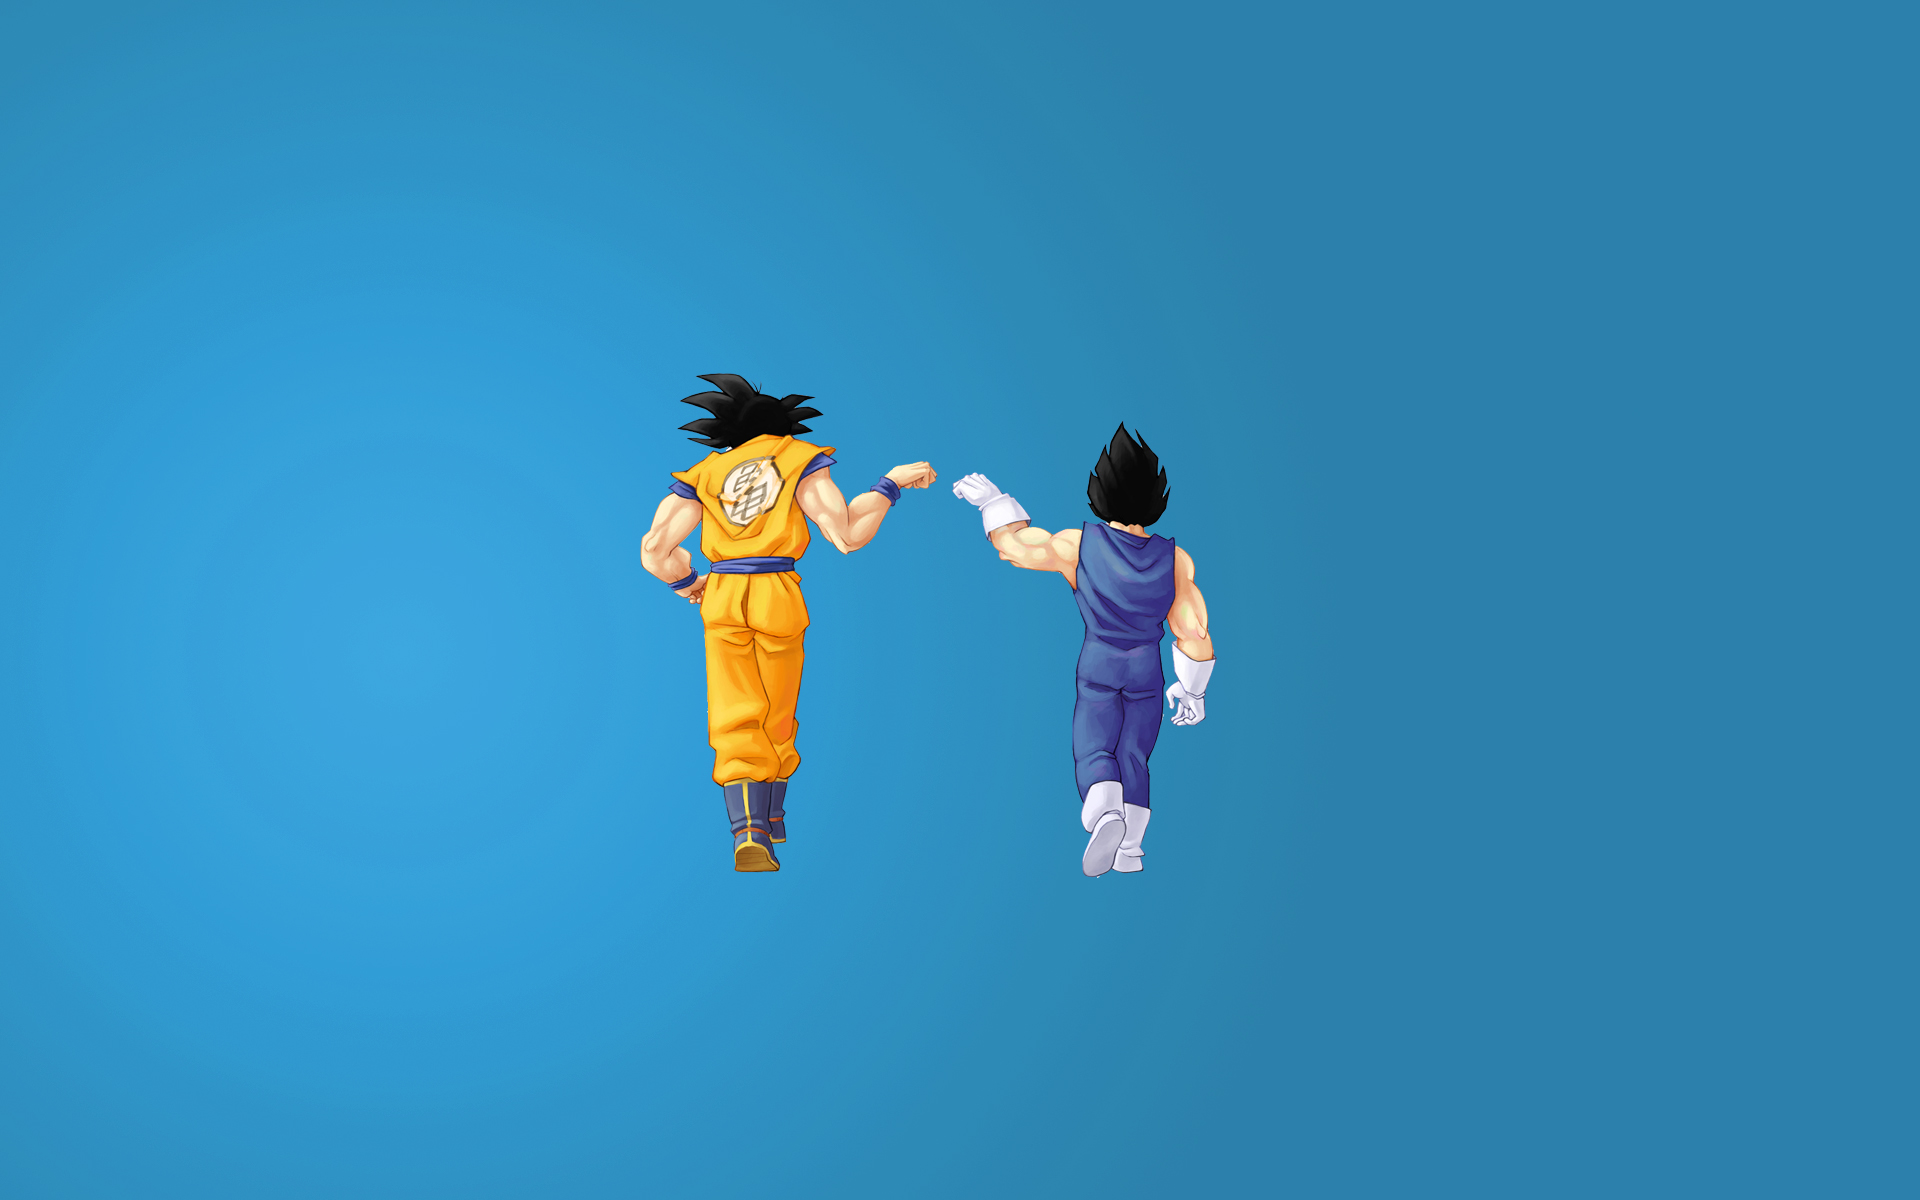 Goku vs Vegeta Iphone Wallpaper Vegeta Goku Wallpaper 1920x1200